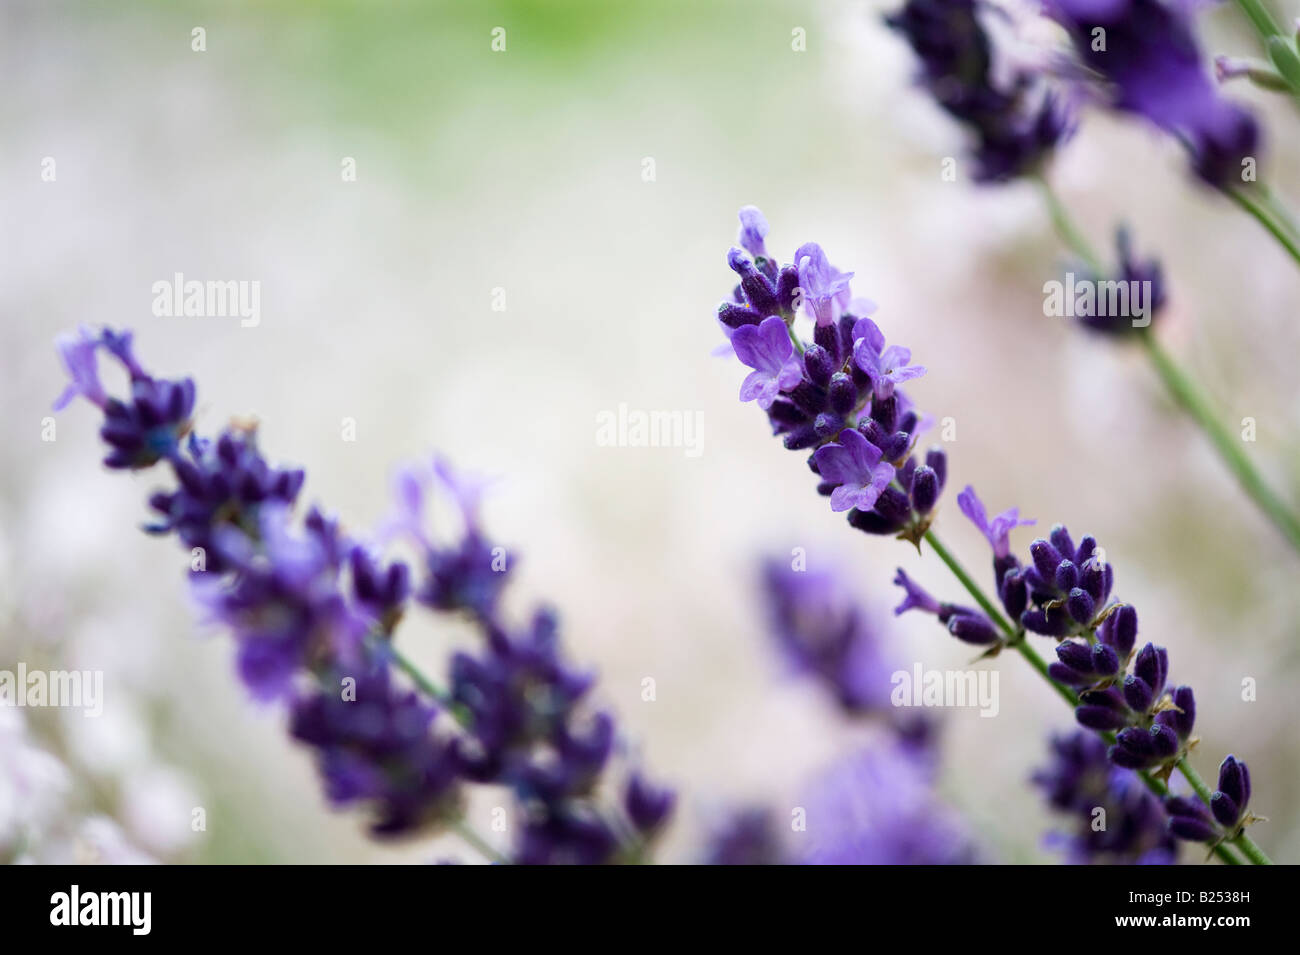 Lavandula angustifolia. Lavender in flower - Stock Image